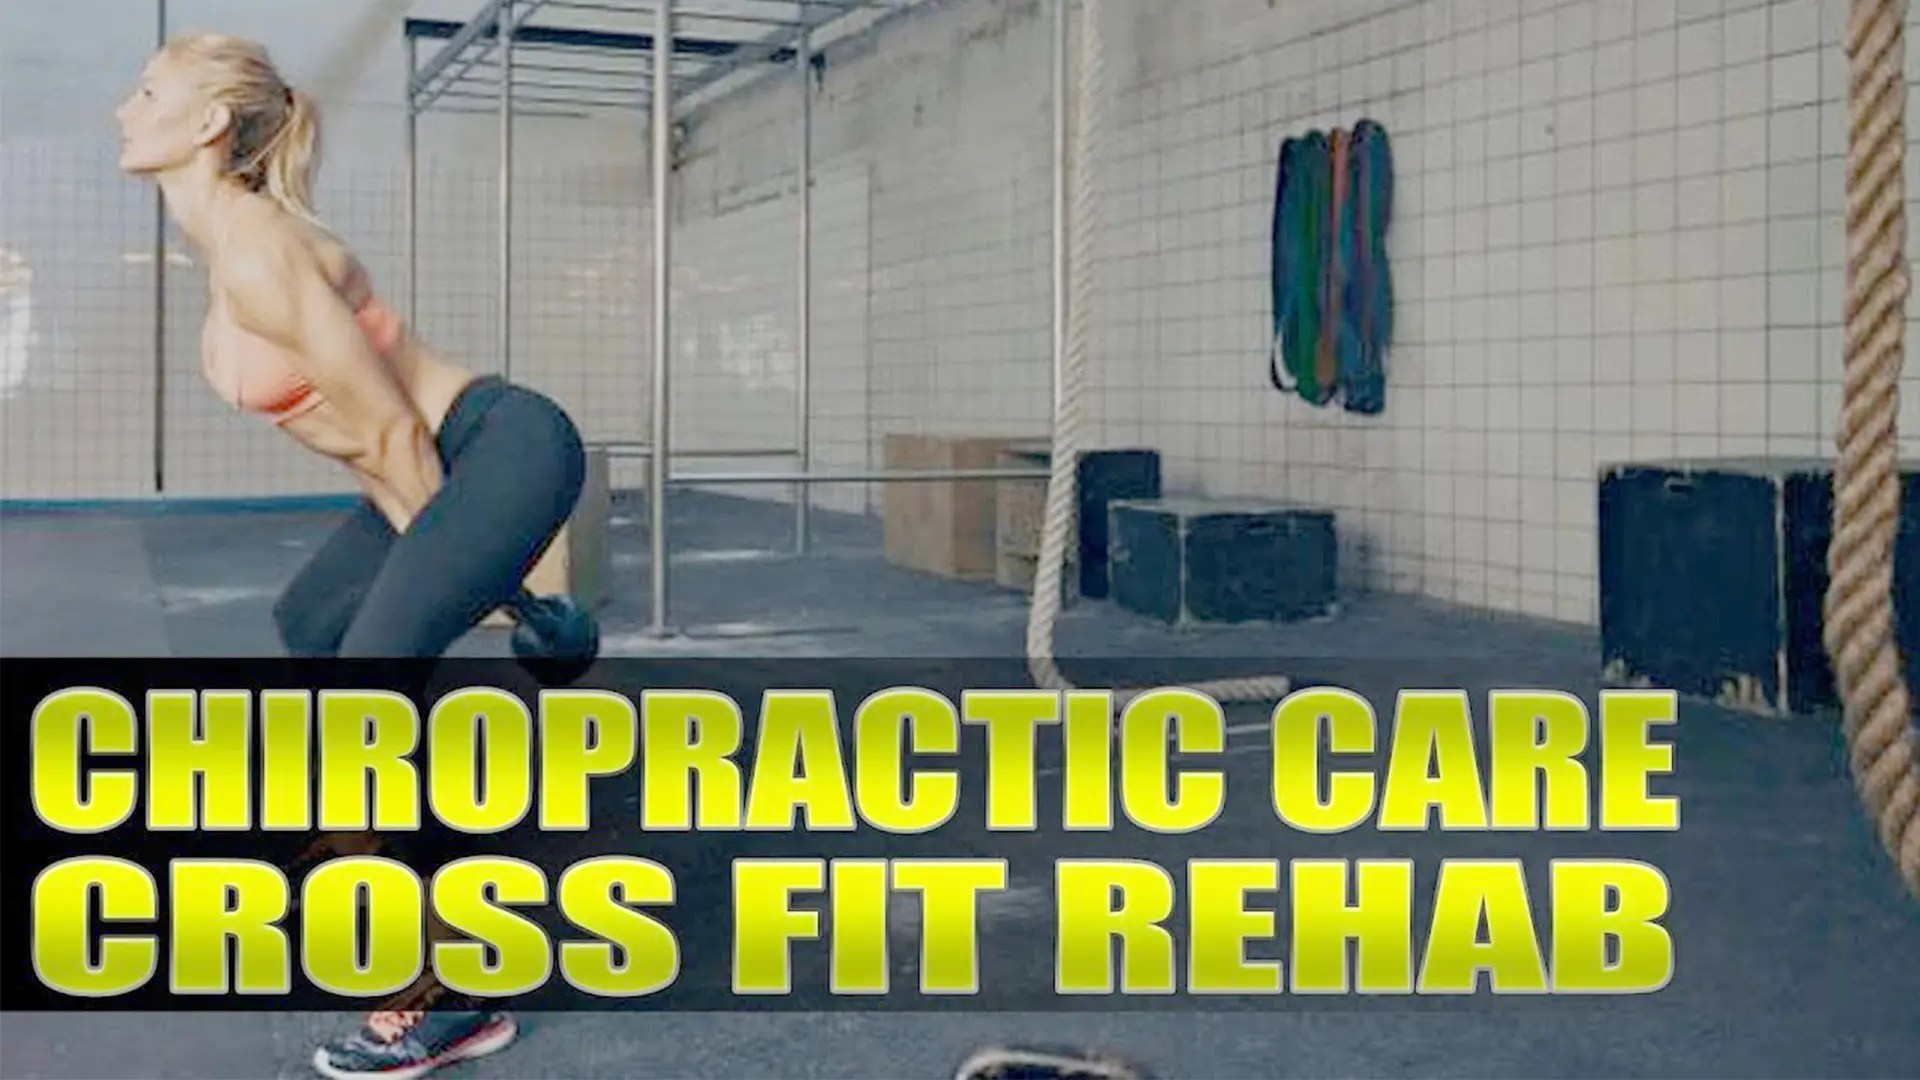 Crossfit Rehabilitation Chiropractor